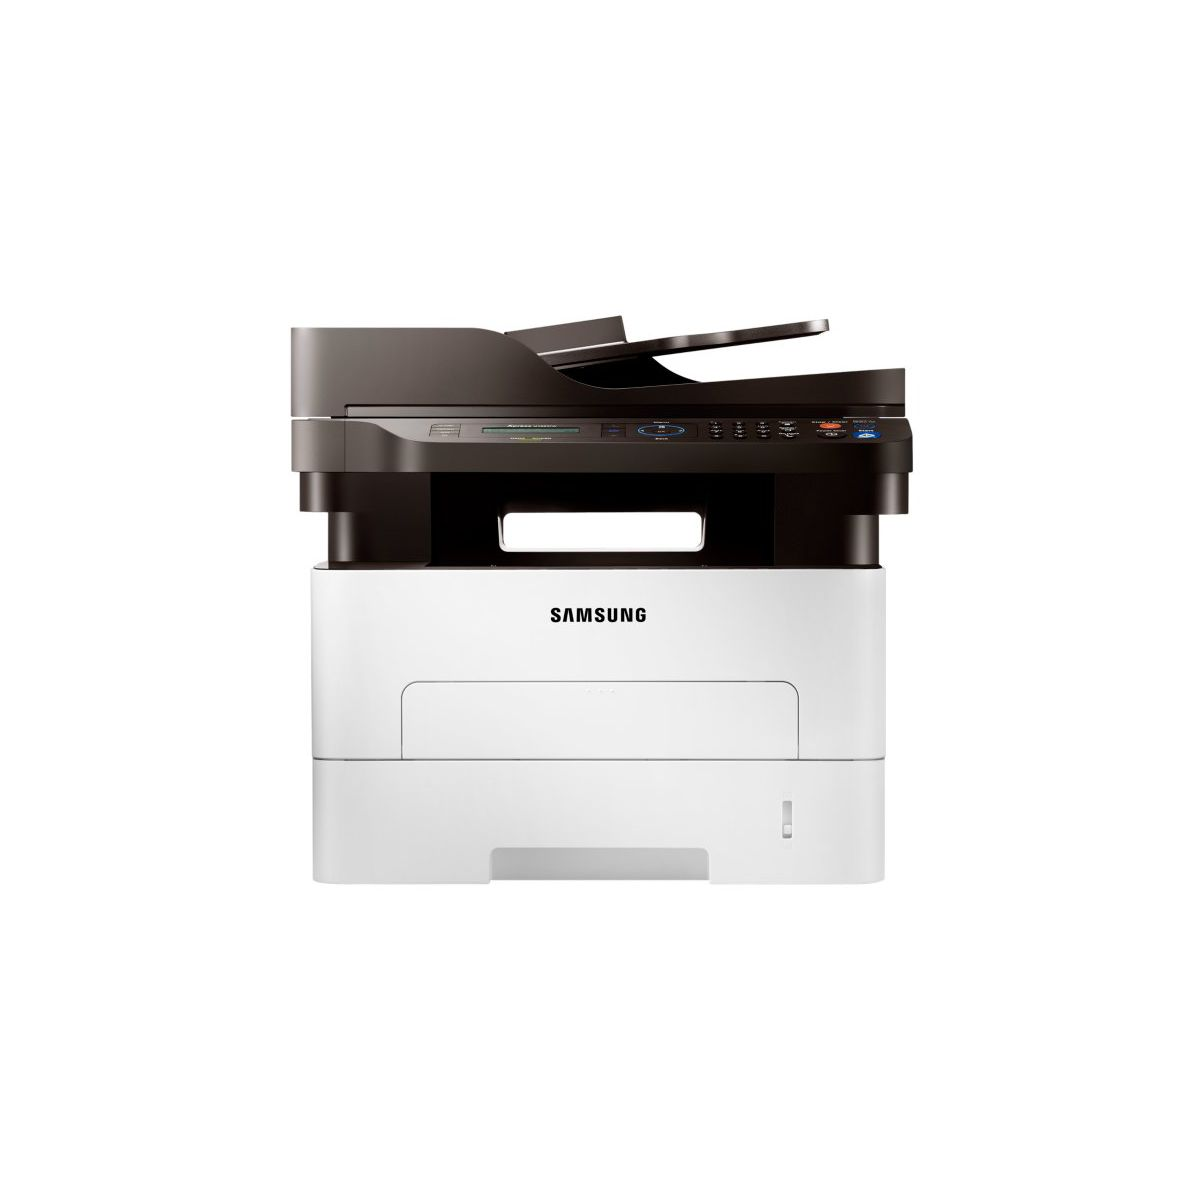 Imprimante multifonction laser monochrome SAMSUNG SL-M2885FW (photo)